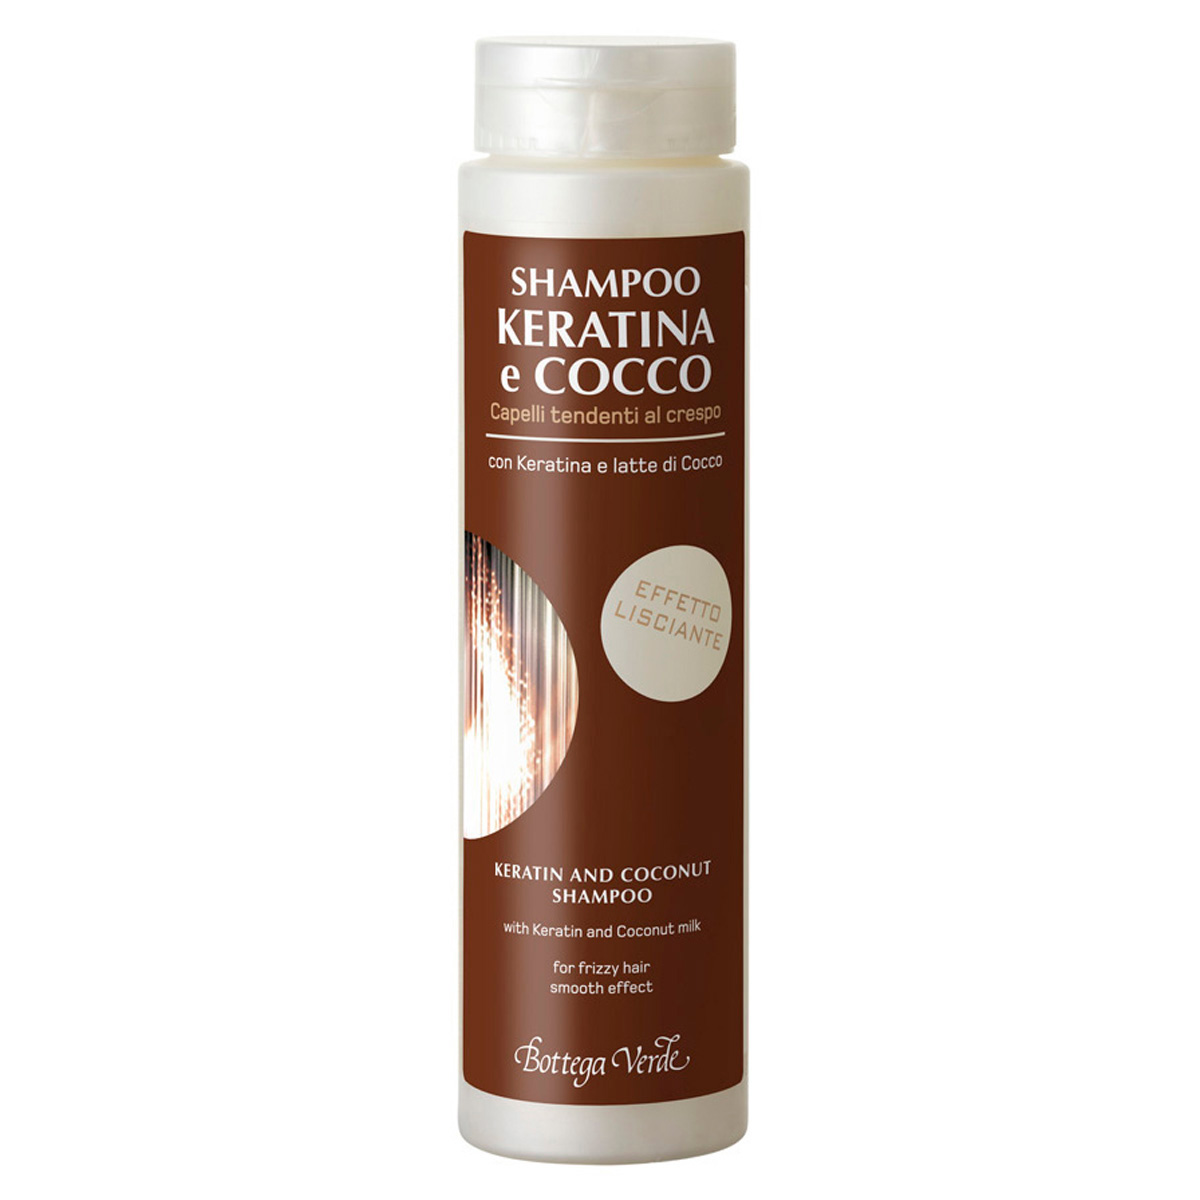 Cocos si Keratina - Sampon cu keratina si lapte de cocos - efect de netezire - par care tinde sa se increteasca